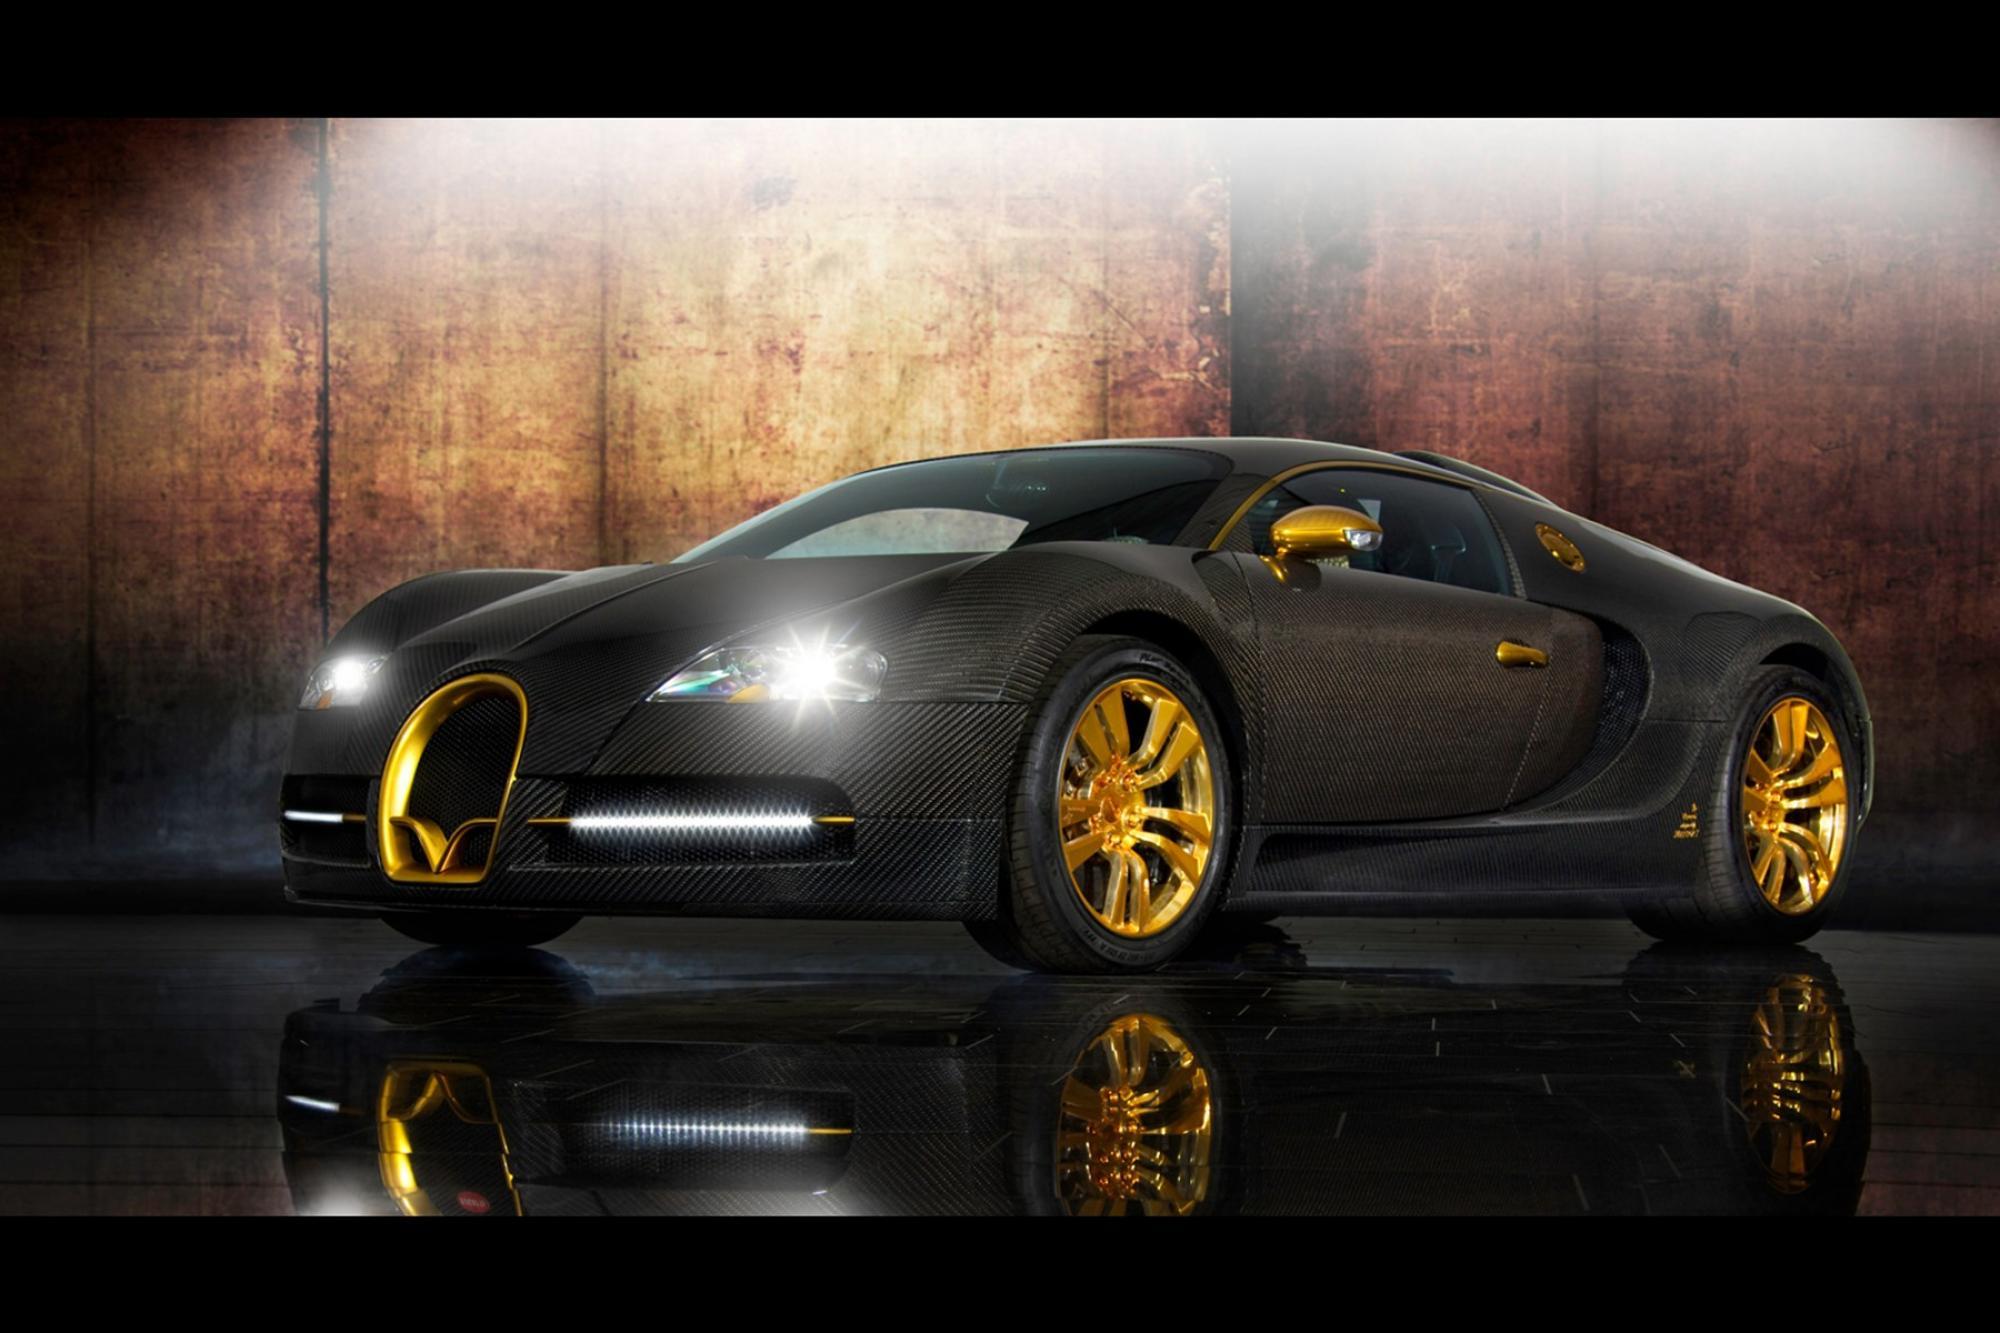 Muscle Cars Burnout Wallpapers Custom Bugatti Veyron Wallpaper Faxo Faxo